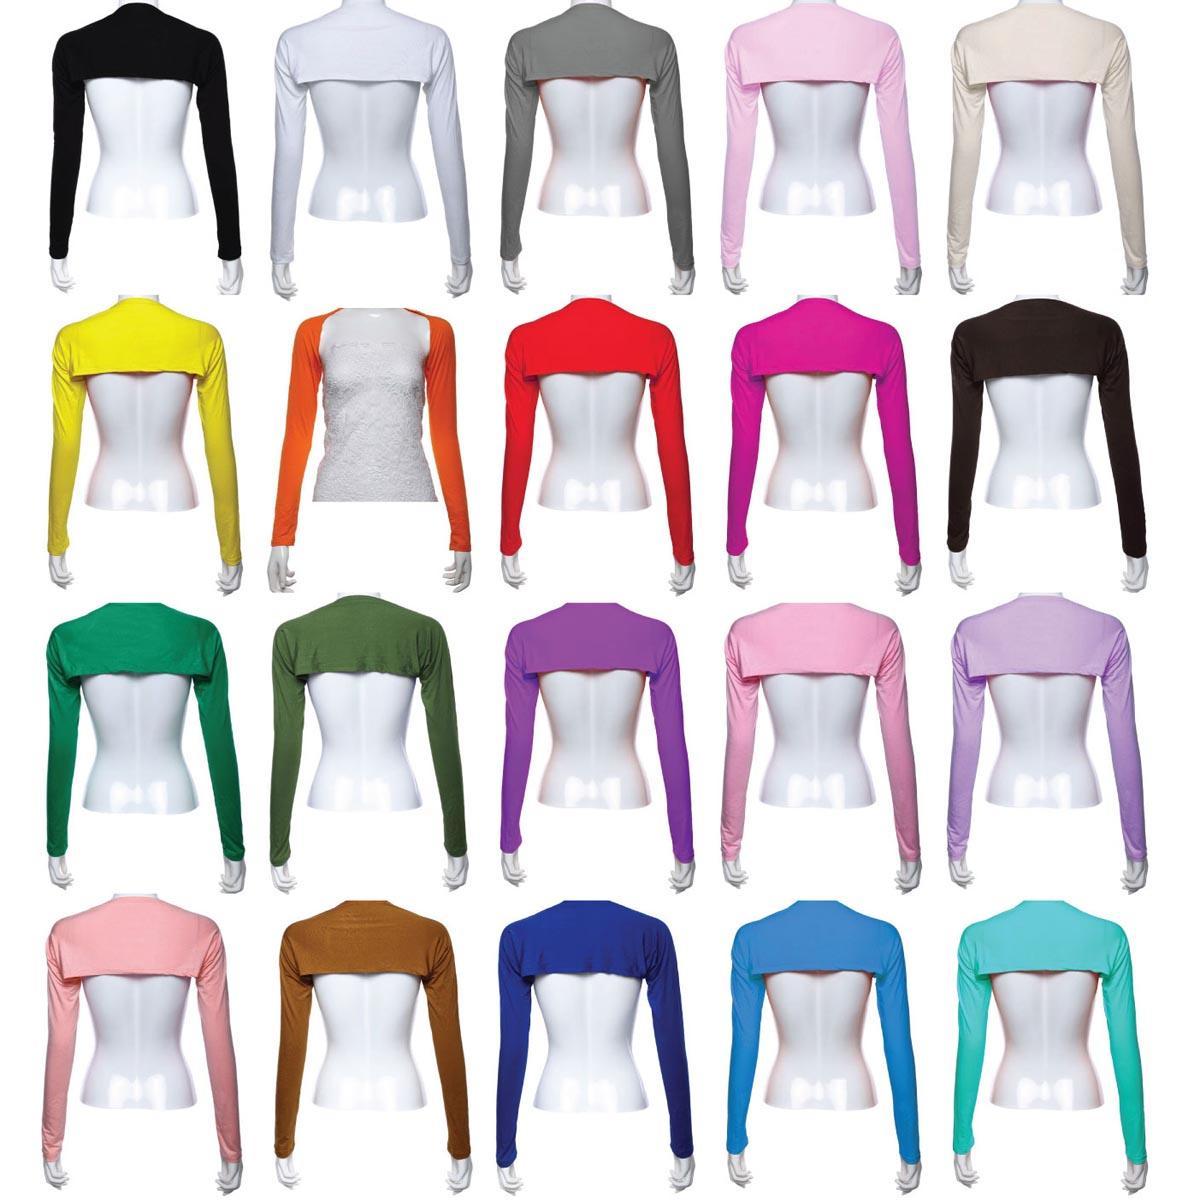 Ramadan Clothes One Piece Sleeves Arm Cover Shrug Bolero Wrap Hayaa Muslim Women Islamic Long Sleeve Shawl Sun Protection Sleeve